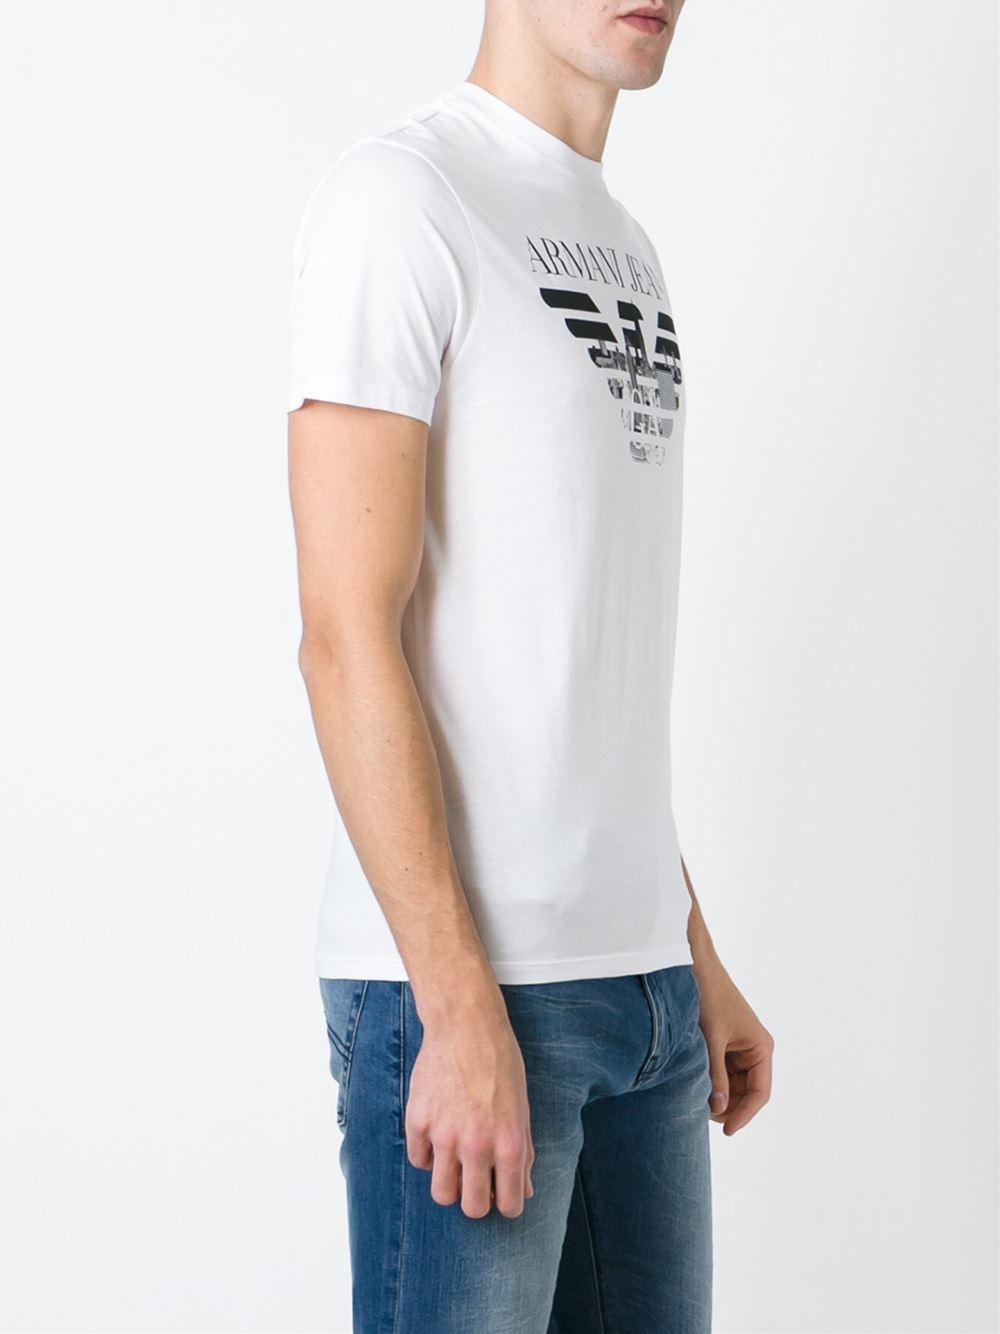 armani jeans logo printed t shirt in white for men lyst. Black Bedroom Furniture Sets. Home Design Ideas